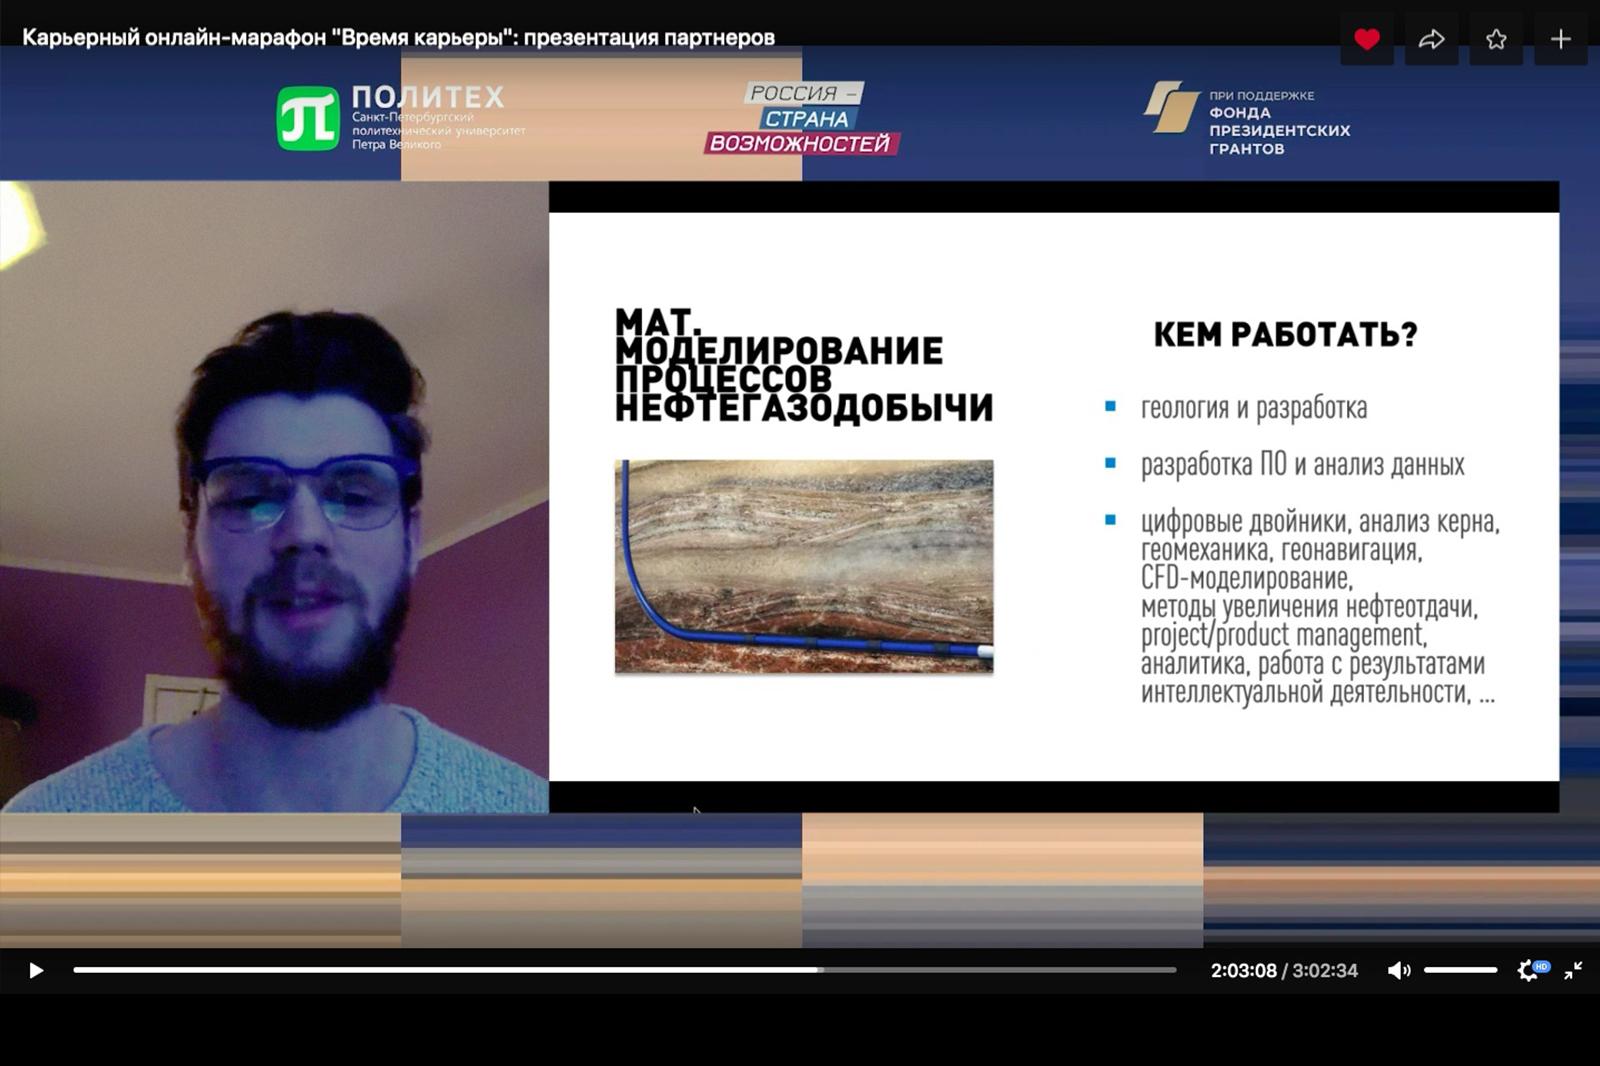 Магистратуру ВШТМ презентовали на онлайн-марафоне «Время карьеры»